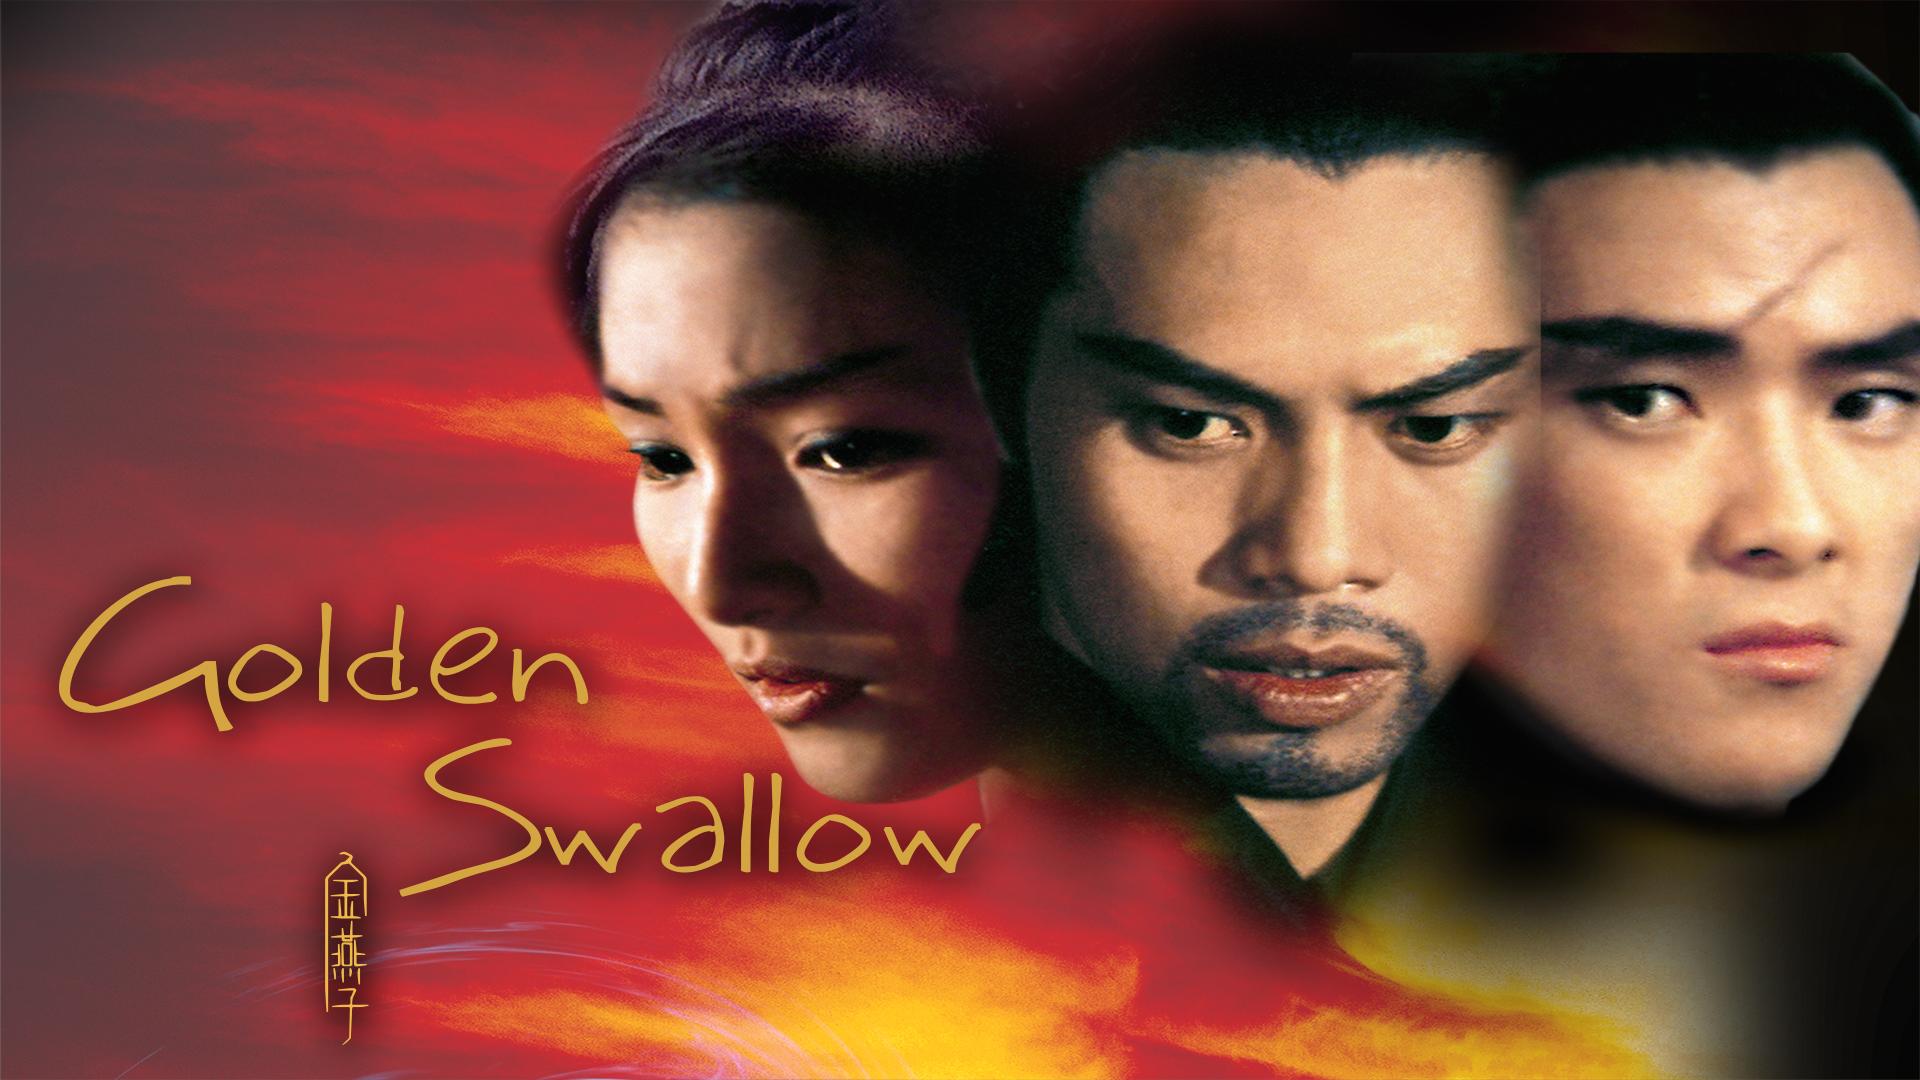 Golden Swallow